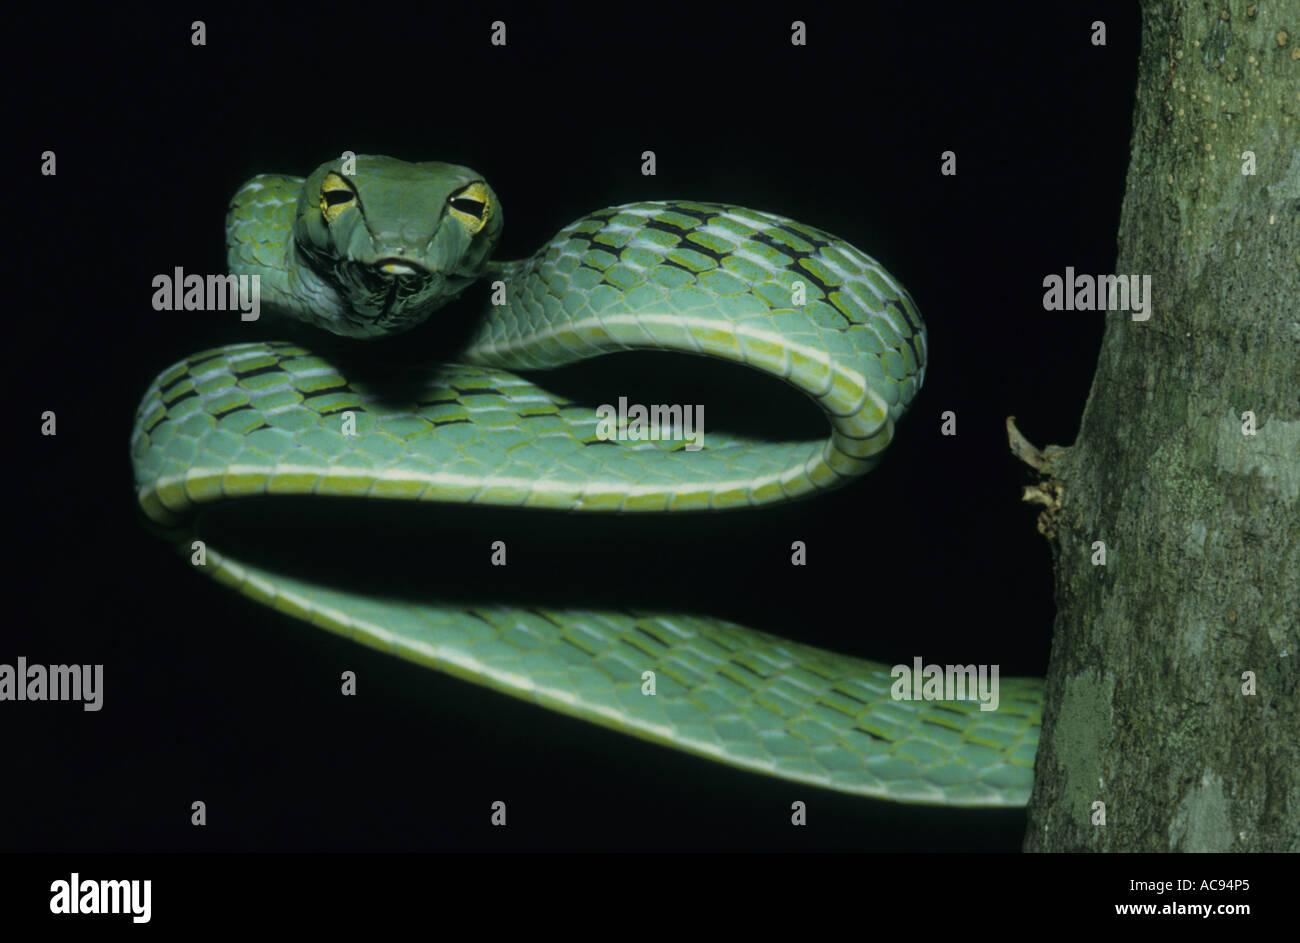 Árbol de larga nariz de serpiente, de larga nariz, whipsnake whipsnake Orientales (Ahaetulla prasina), vista desde la parte delantera, Indonesia, Sumatra Foto de stock